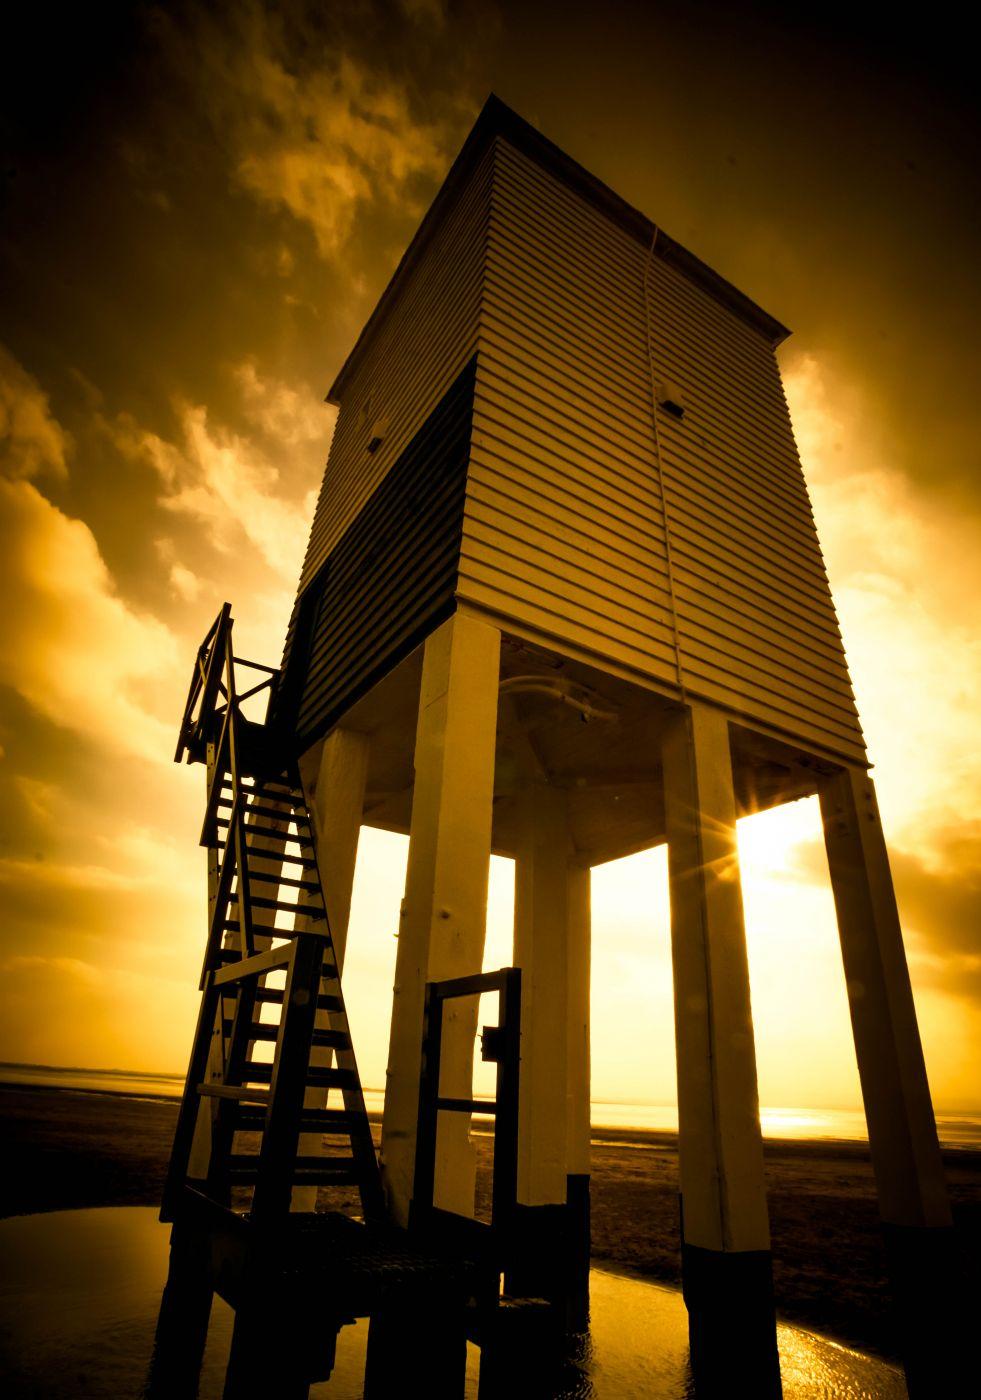 Low Lighthouse, United Kingdom